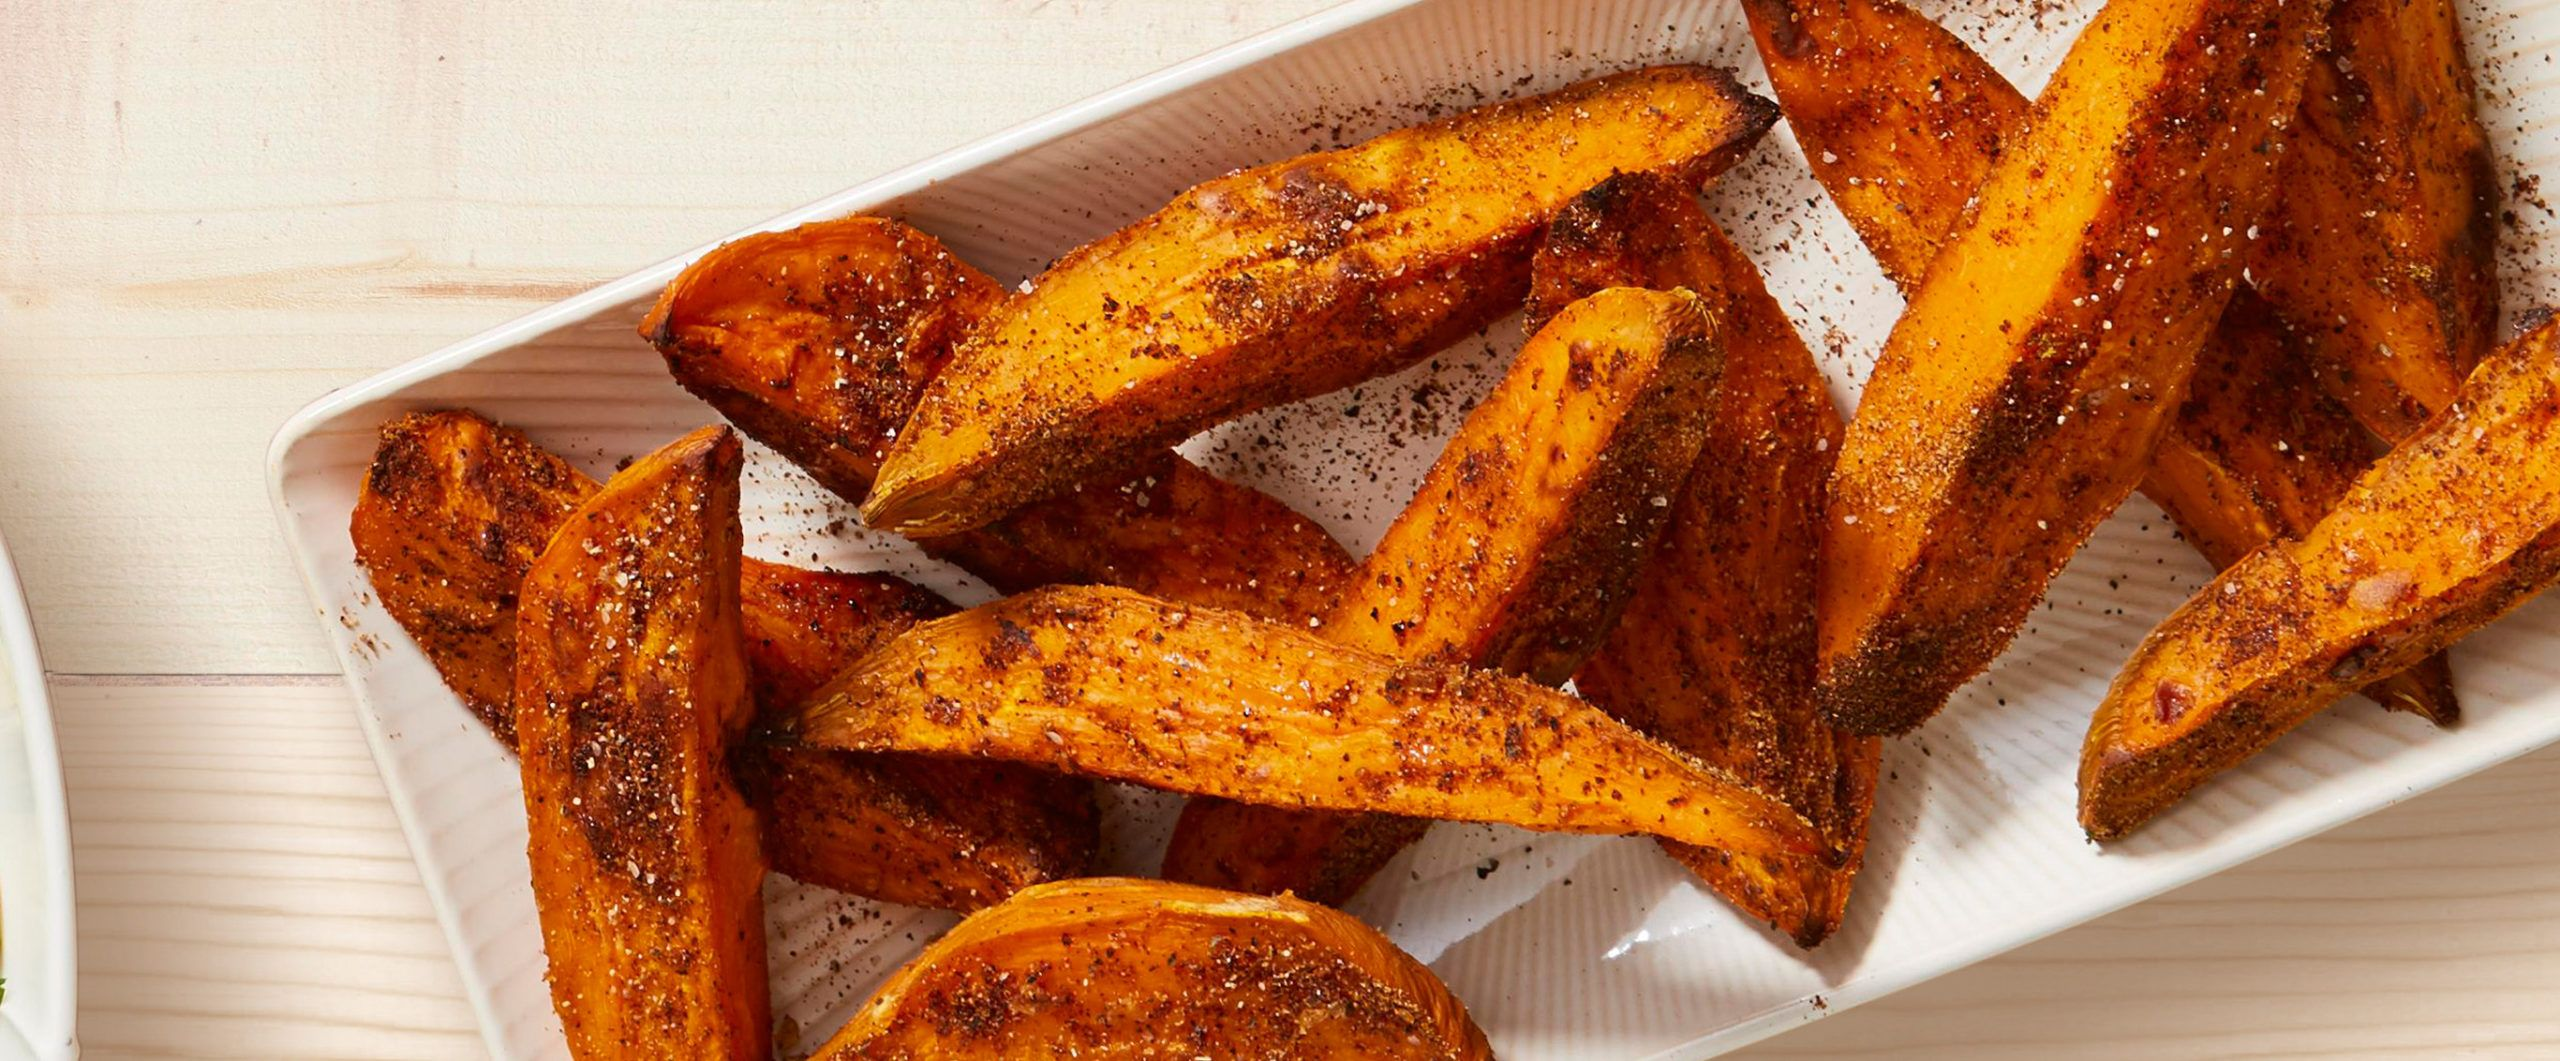 Baked Sweet Potato Pieces